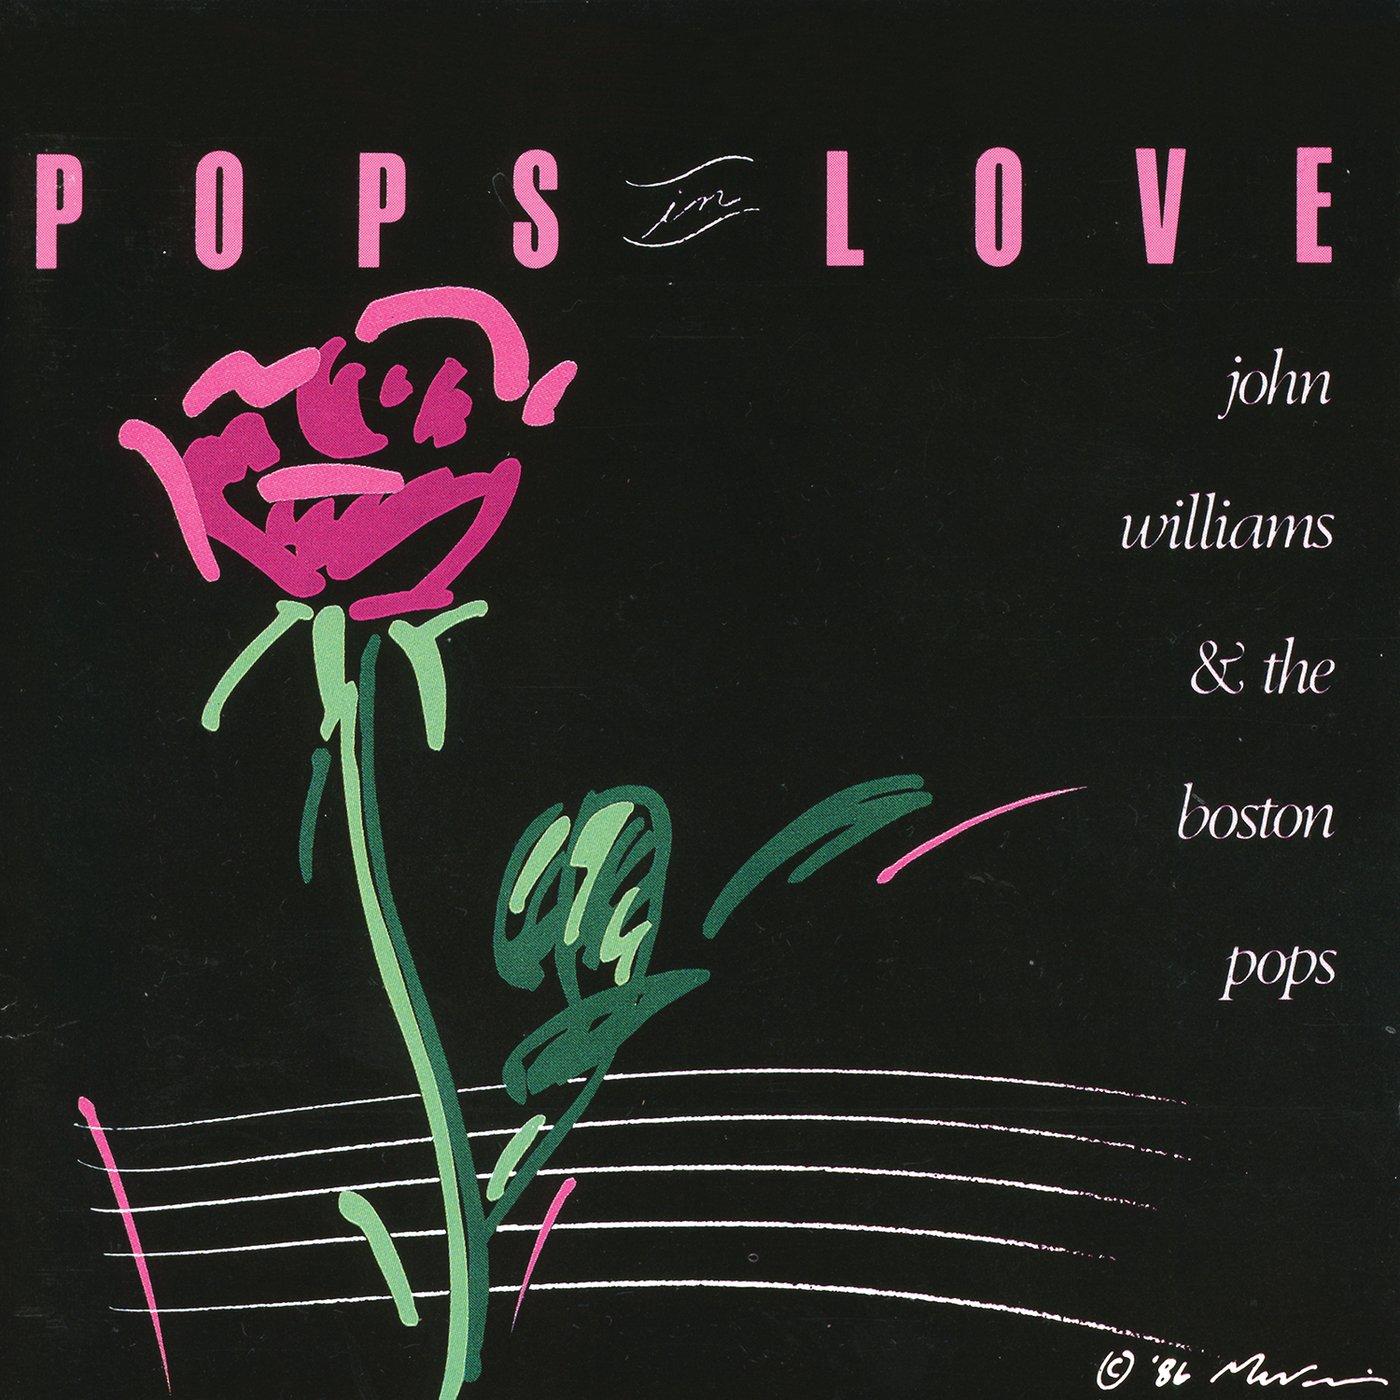 Tomaso Albinoni, Claude Debussy, Gabriel Faure, Johann Pachelbel, Maurice  Ravel, Camille Saint-Saens, Erik Satie, Boston Pops - Pops in Love -  Amazon.com Music